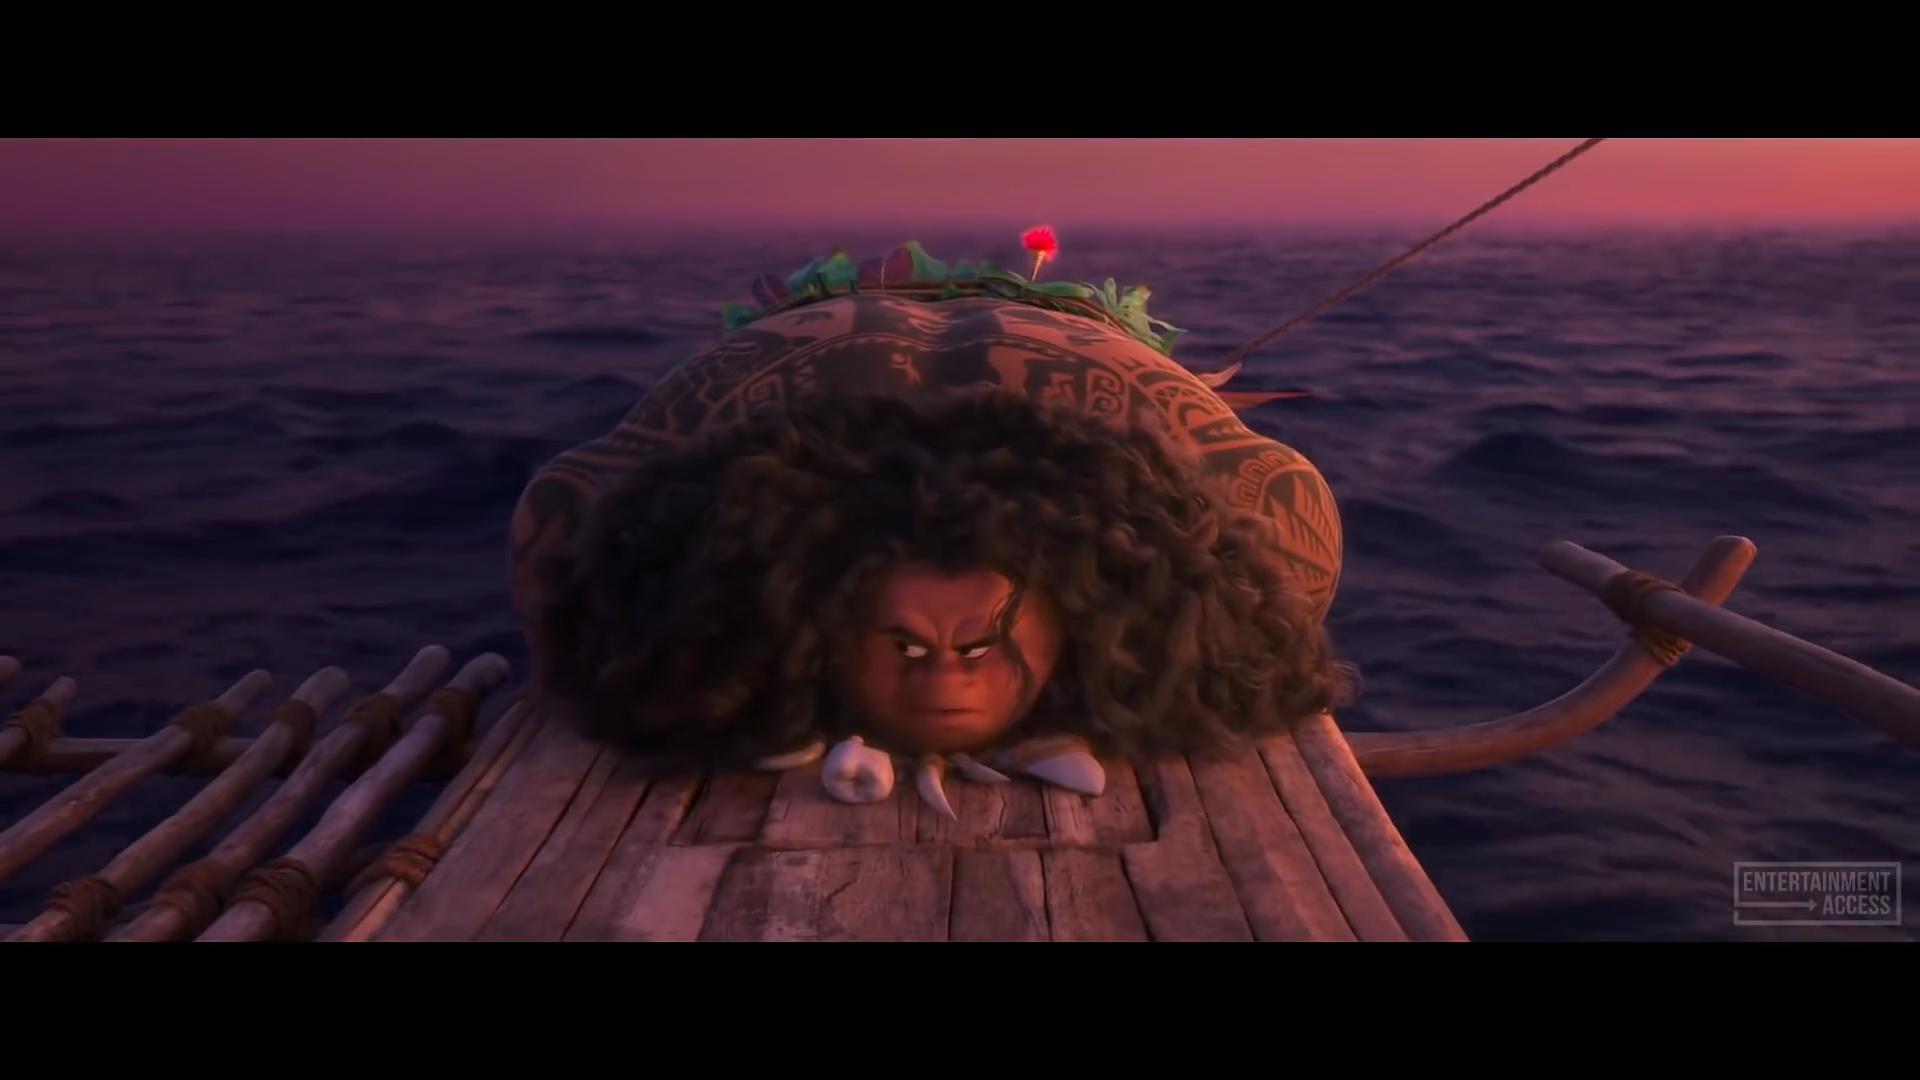 Moana - Teach me to sail